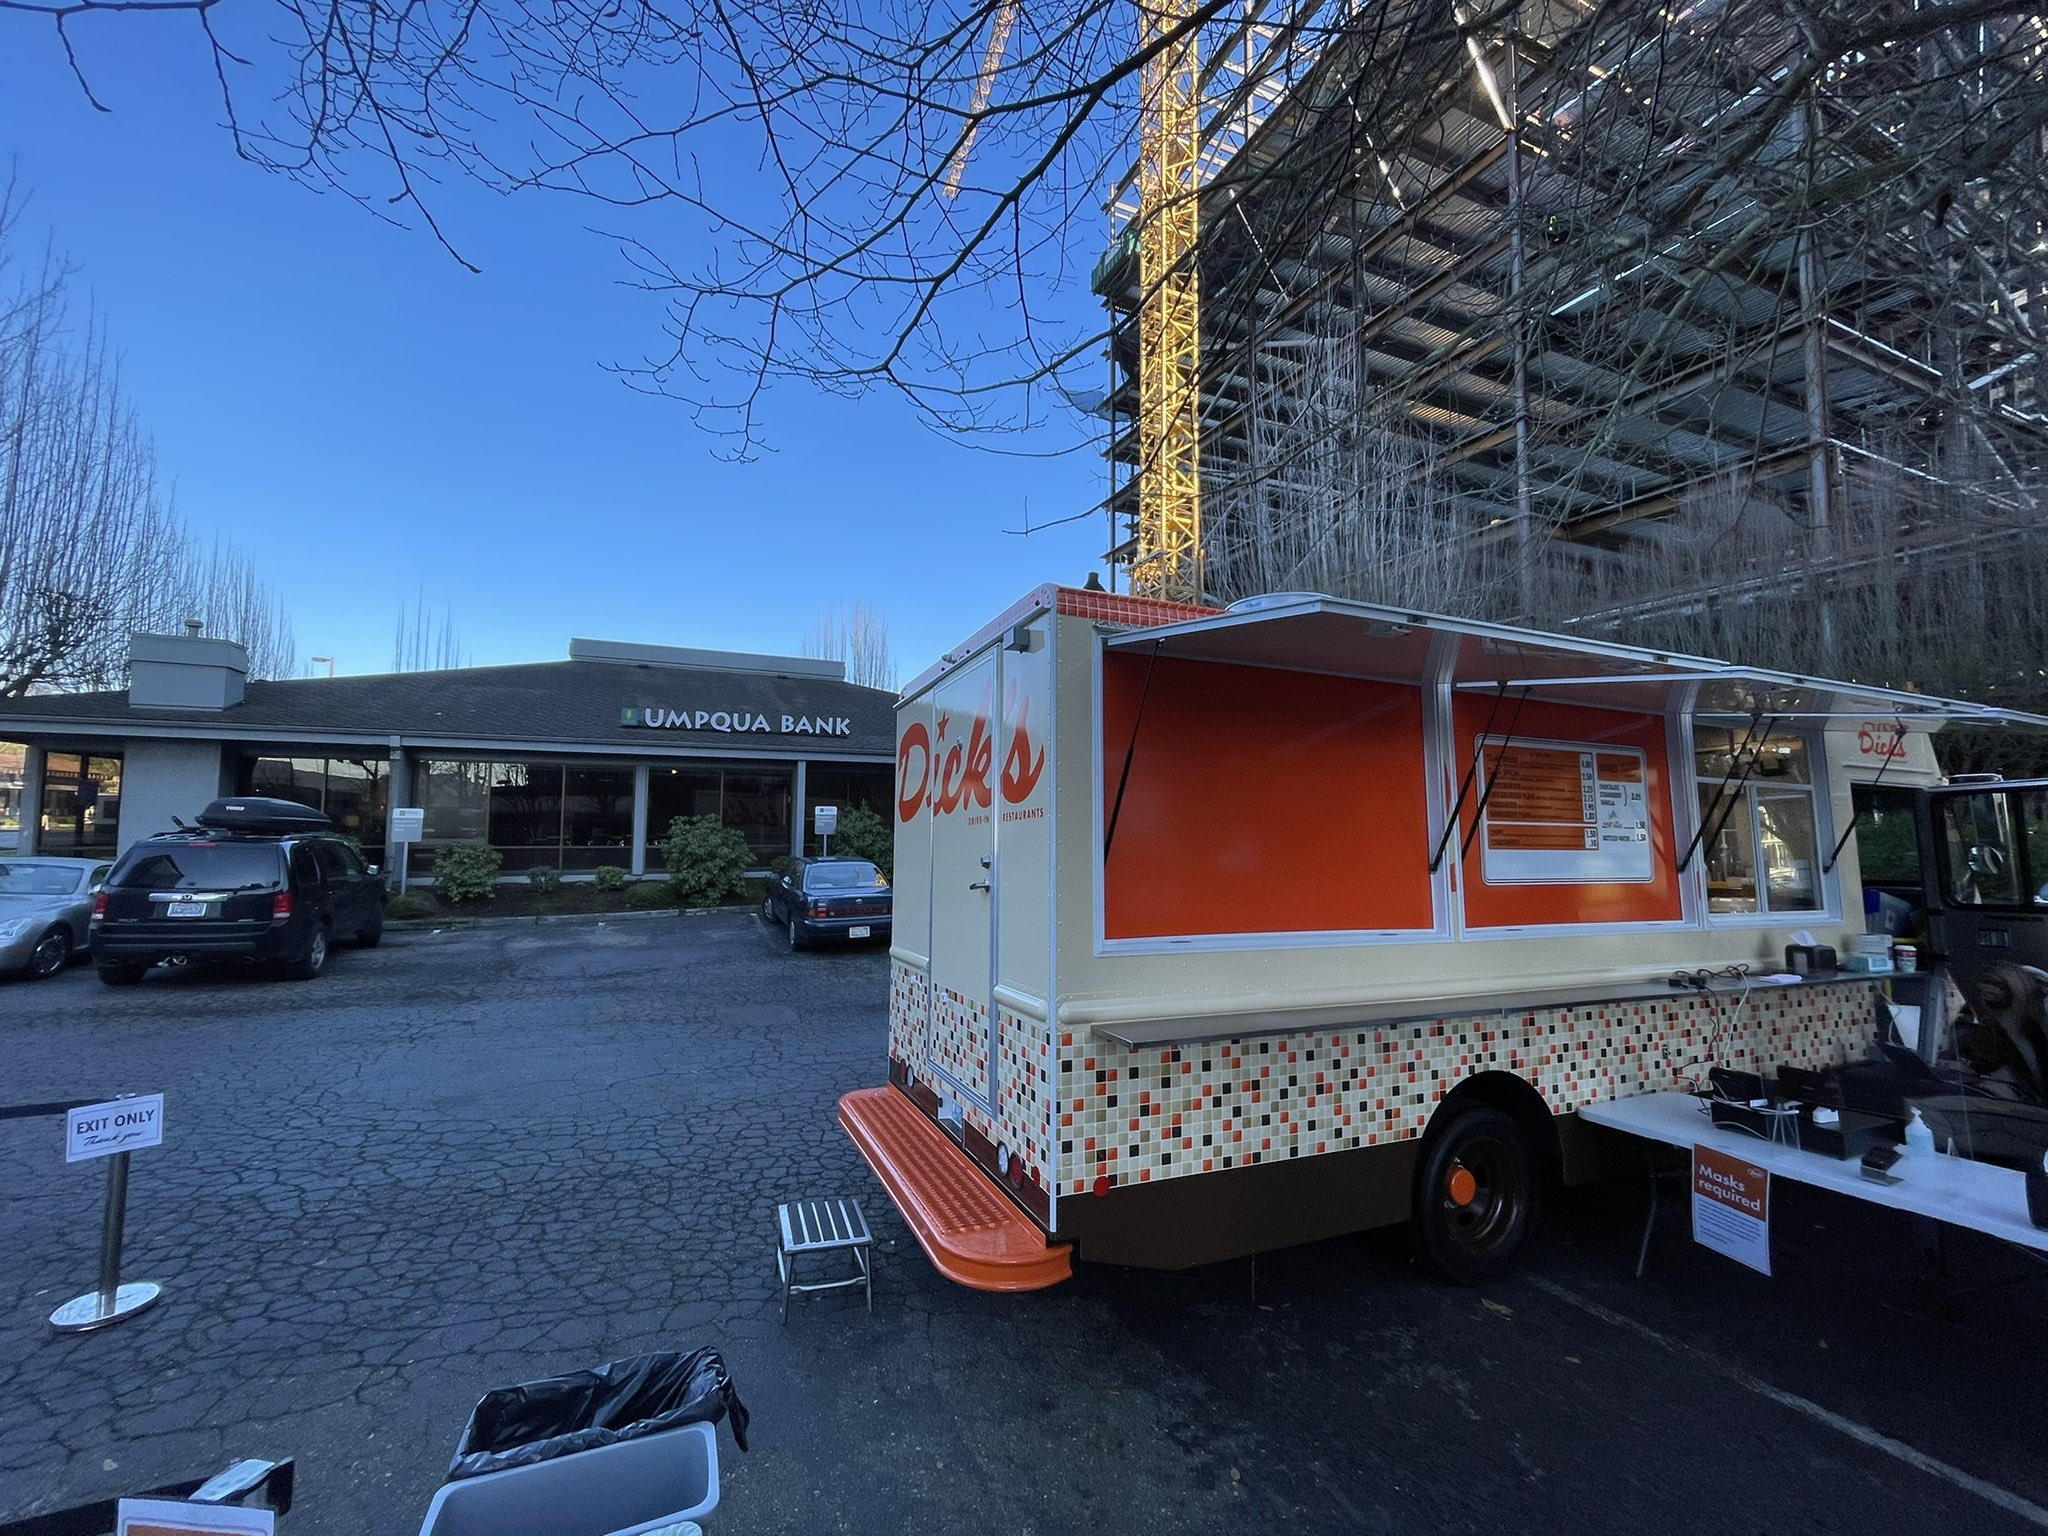 Dick's Drive-In Food Truck in Bellevue